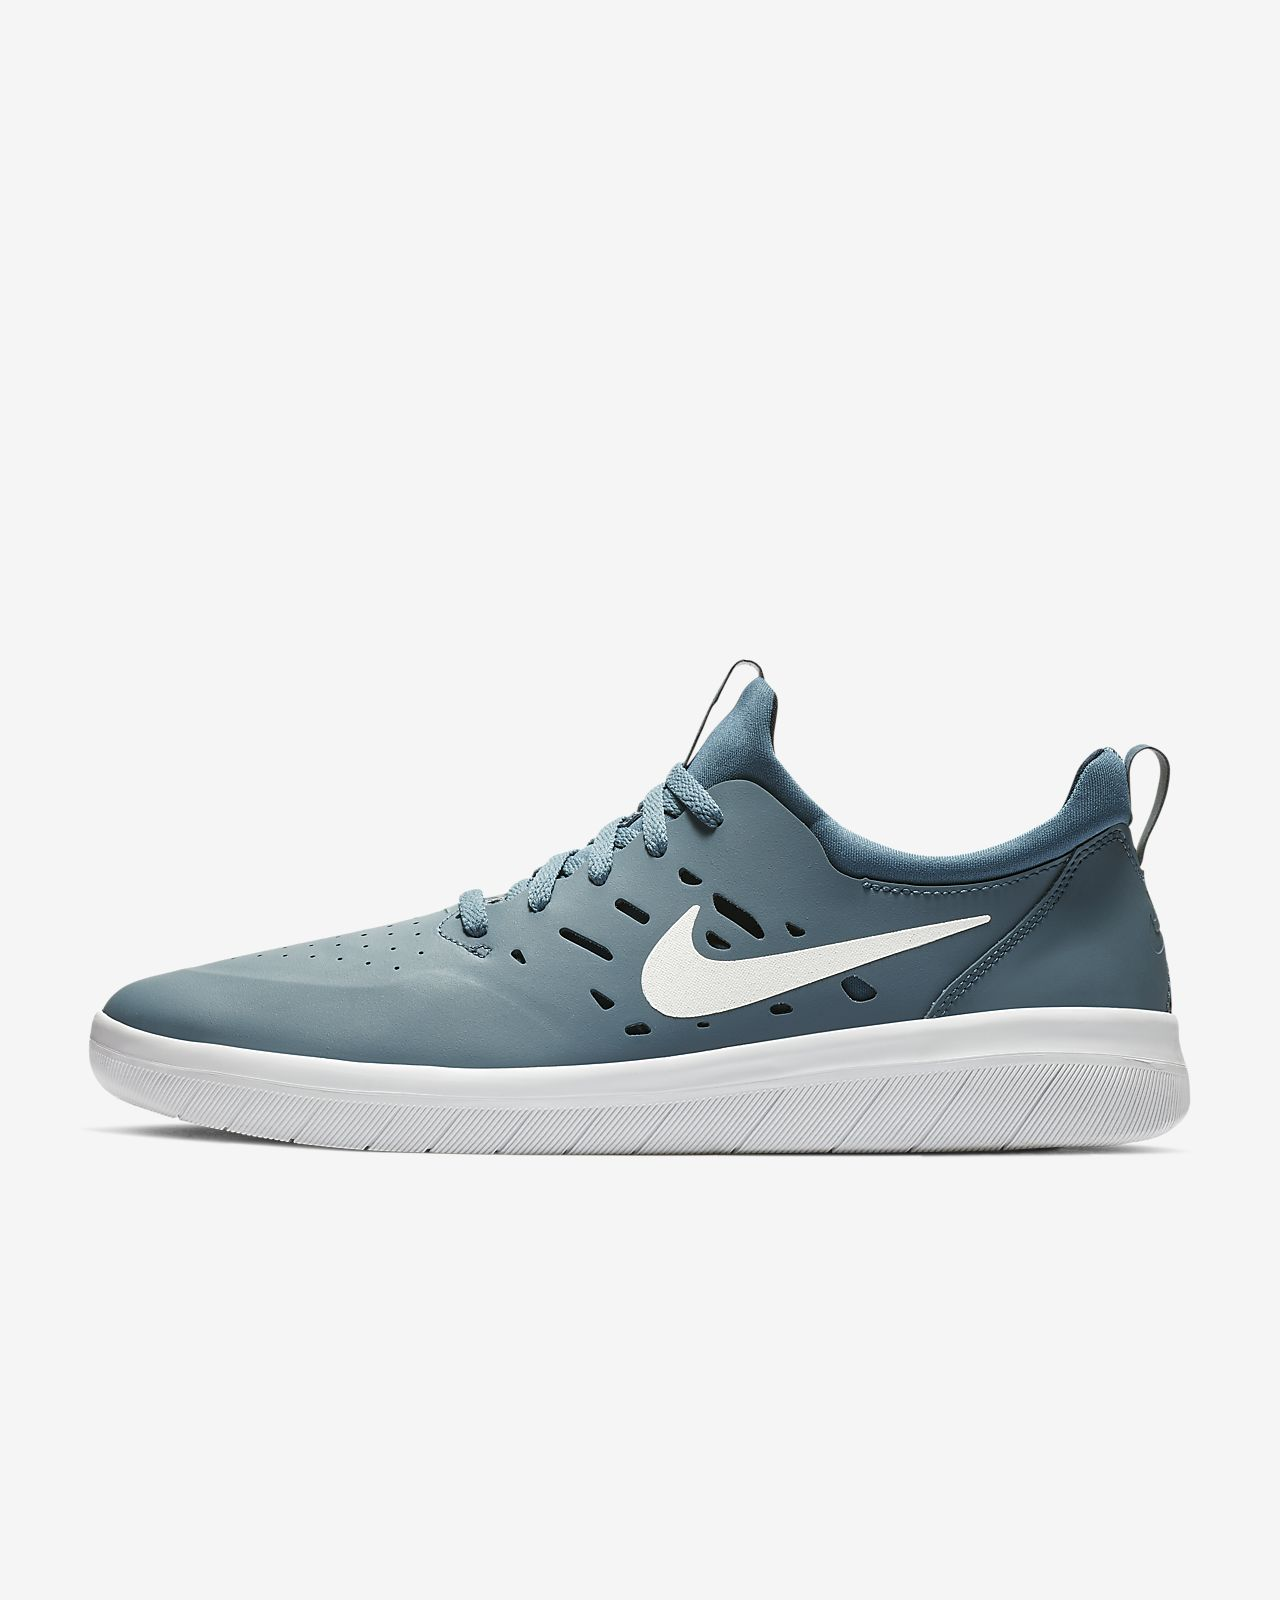 3a8782148a659 Chaussure de skateboard Nike SB Nyjah pour Homme. Nike.com FR